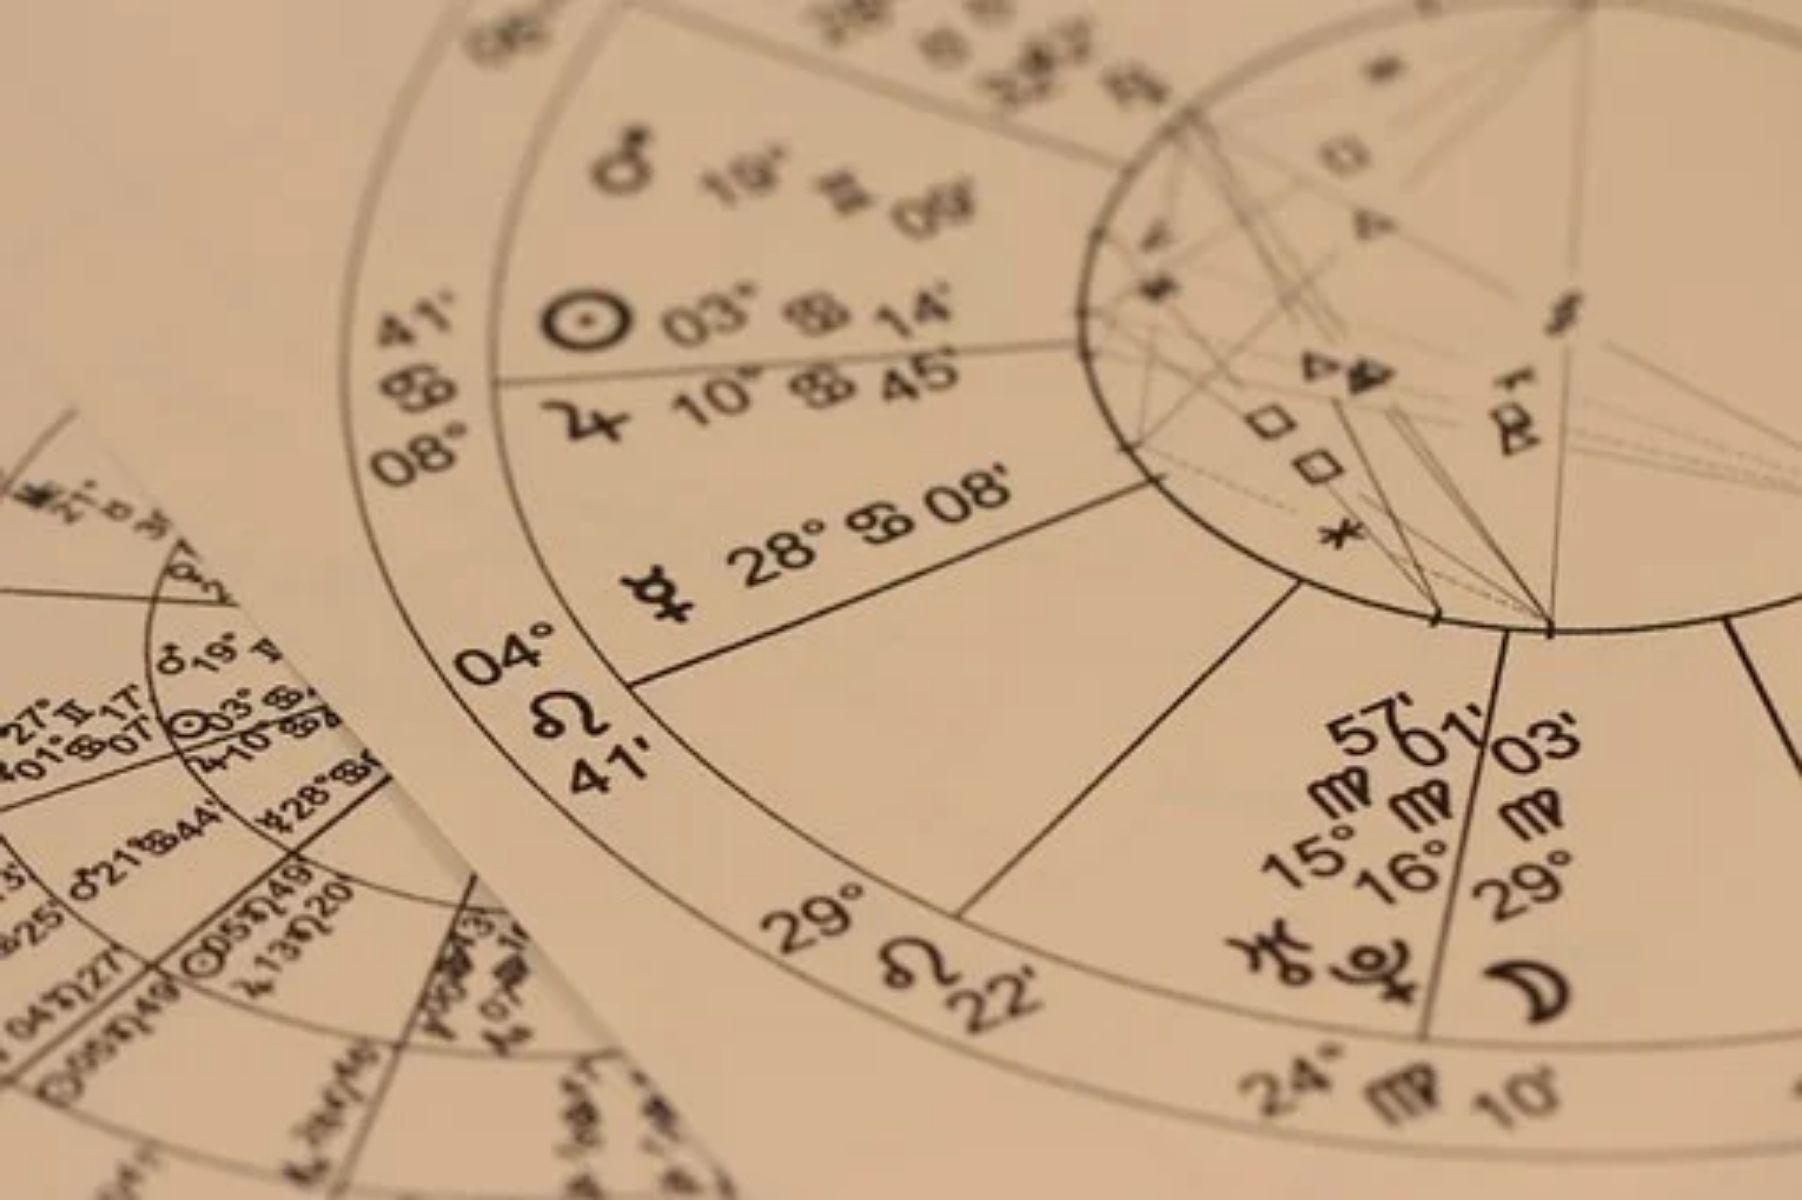 Arquétipos de Carl Jung: 14 exemplos para aprendermos